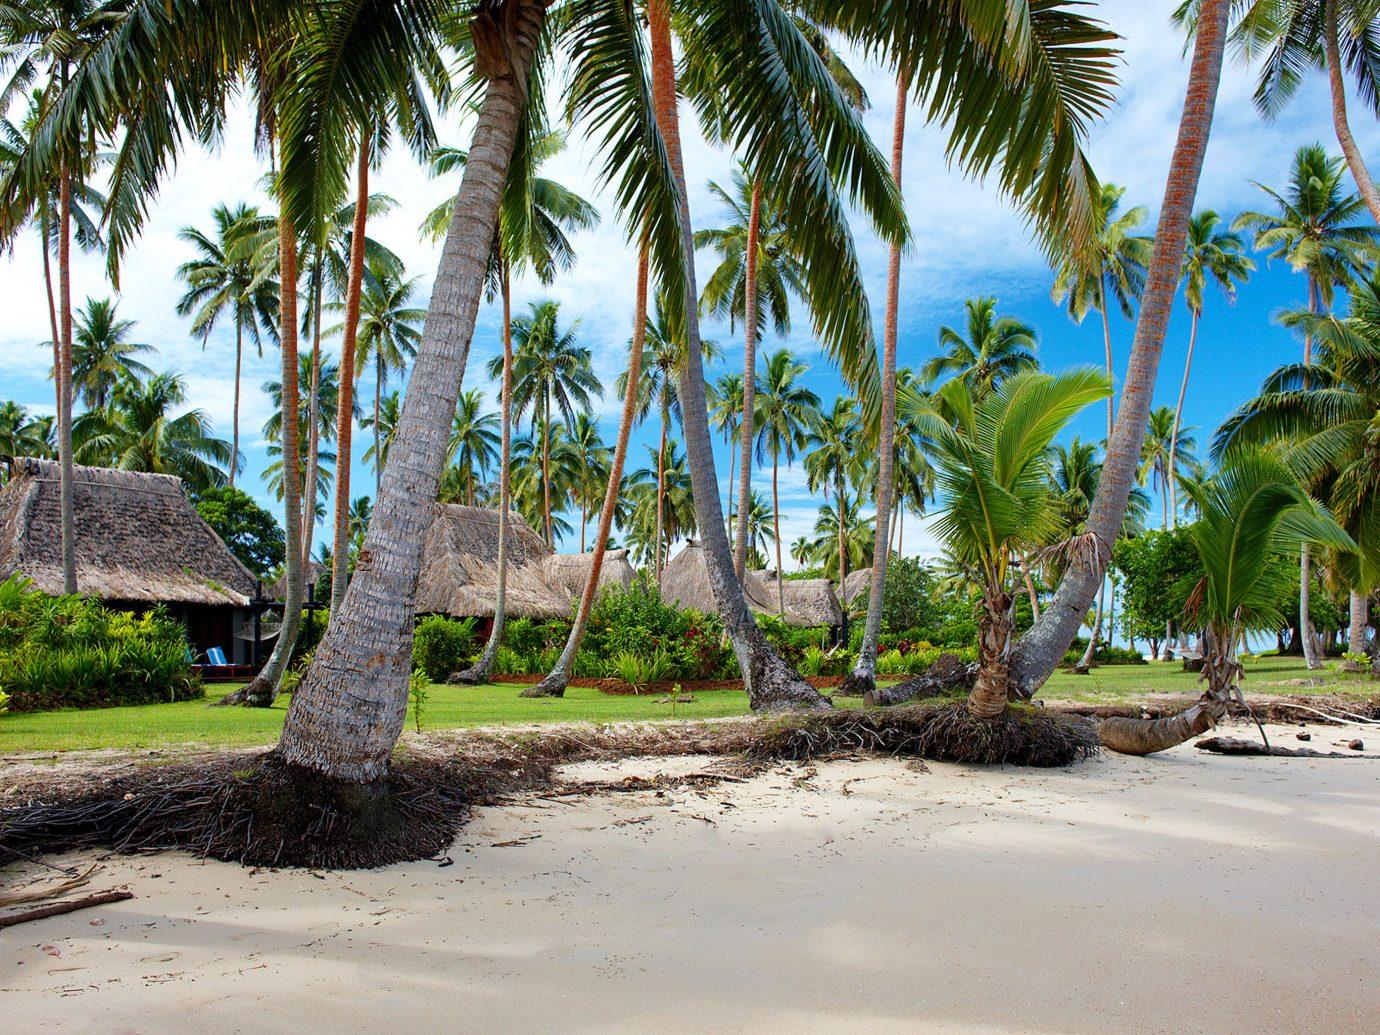 Beach at Jean-Michel Cousteau Resort, Fiji